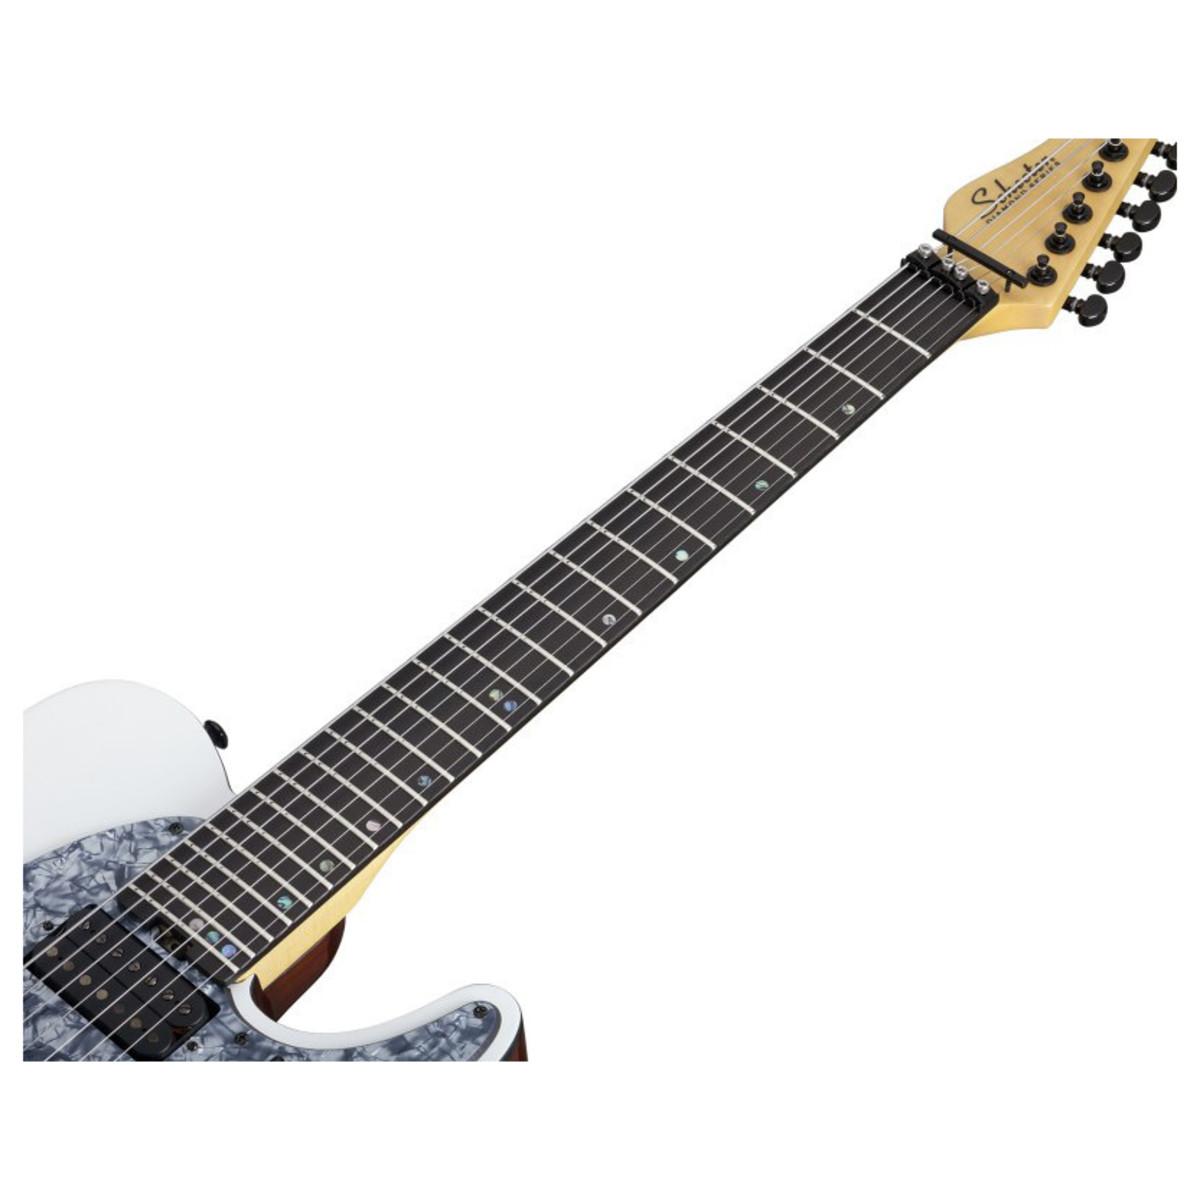 disc schecter wes hauch pt 7 fr electric guitar satin white at. Black Bedroom Furniture Sets. Home Design Ideas